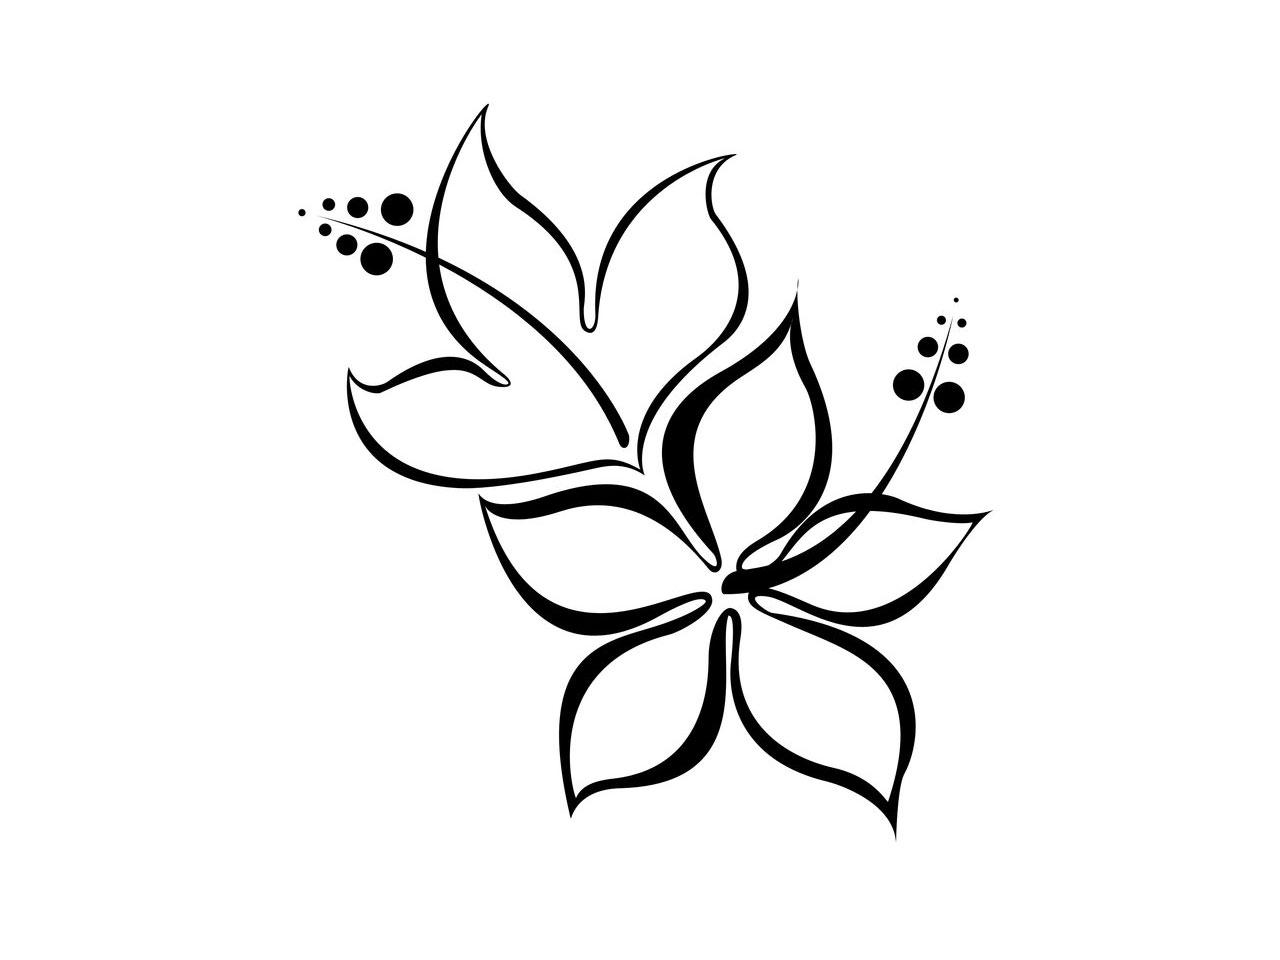 1280x960 Drawing Designs Of Flowers Cross Finger Tattoos Rare Tattoo